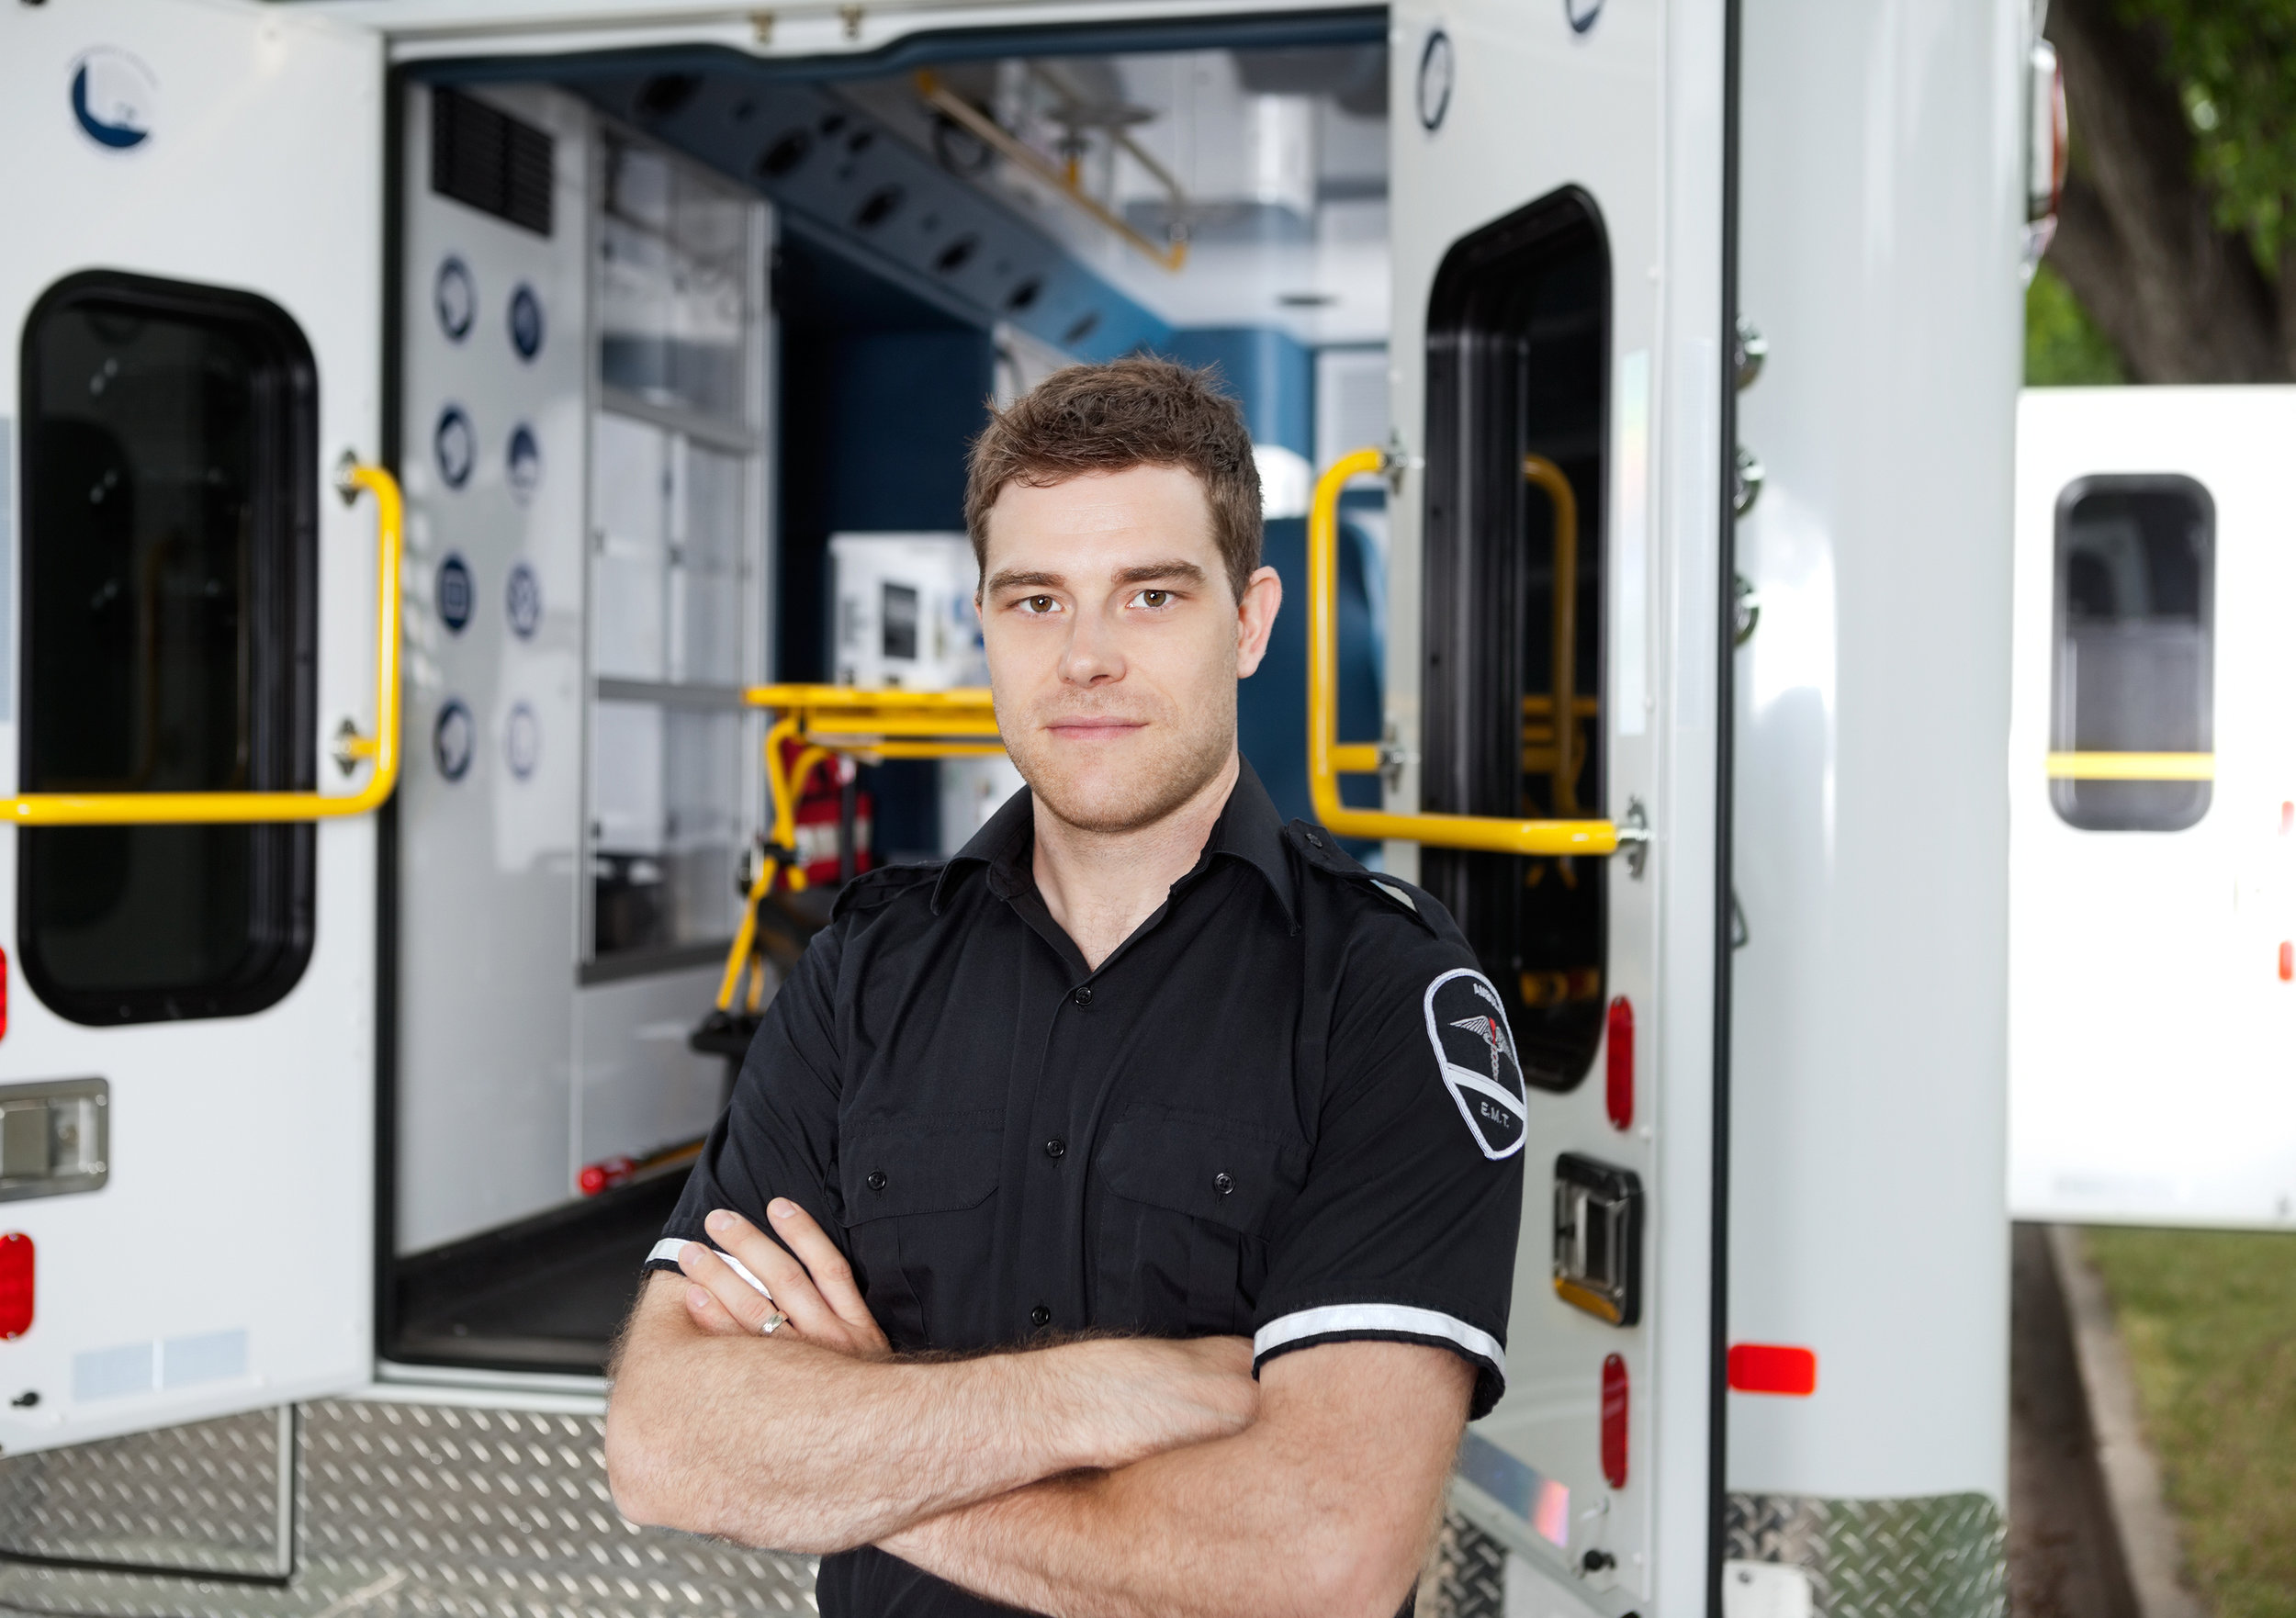 bigstock-Portrait-of-a-male-Ambulance-P-24233348.jpg